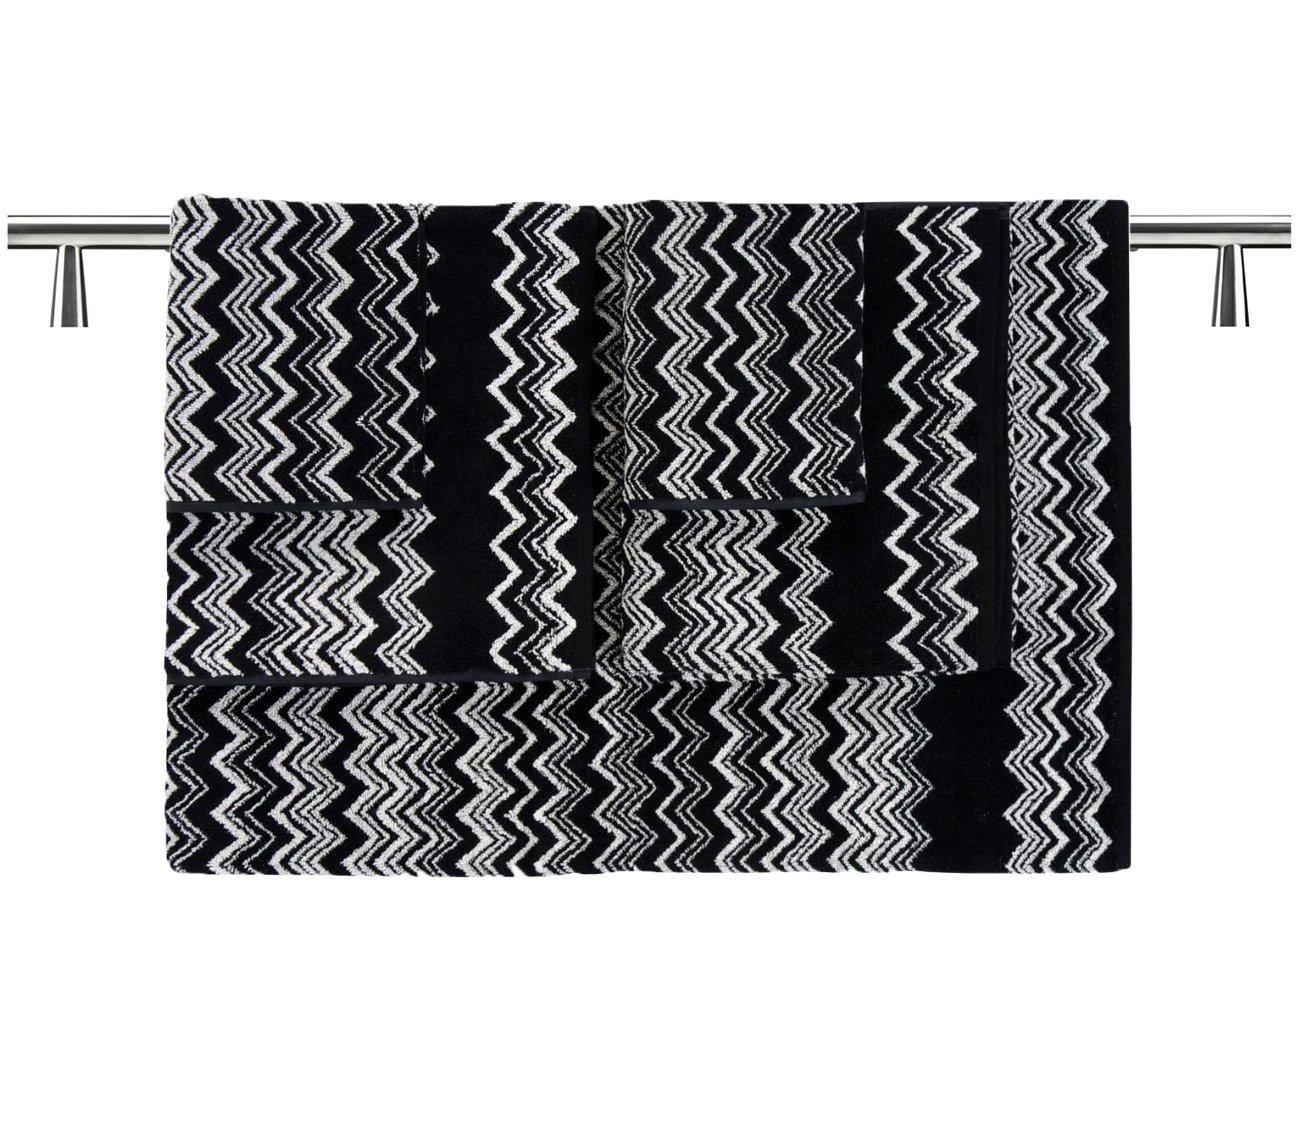 MISSONI HOME KEITH 5-piece set BLACK AND WHITE ZIG ZAG